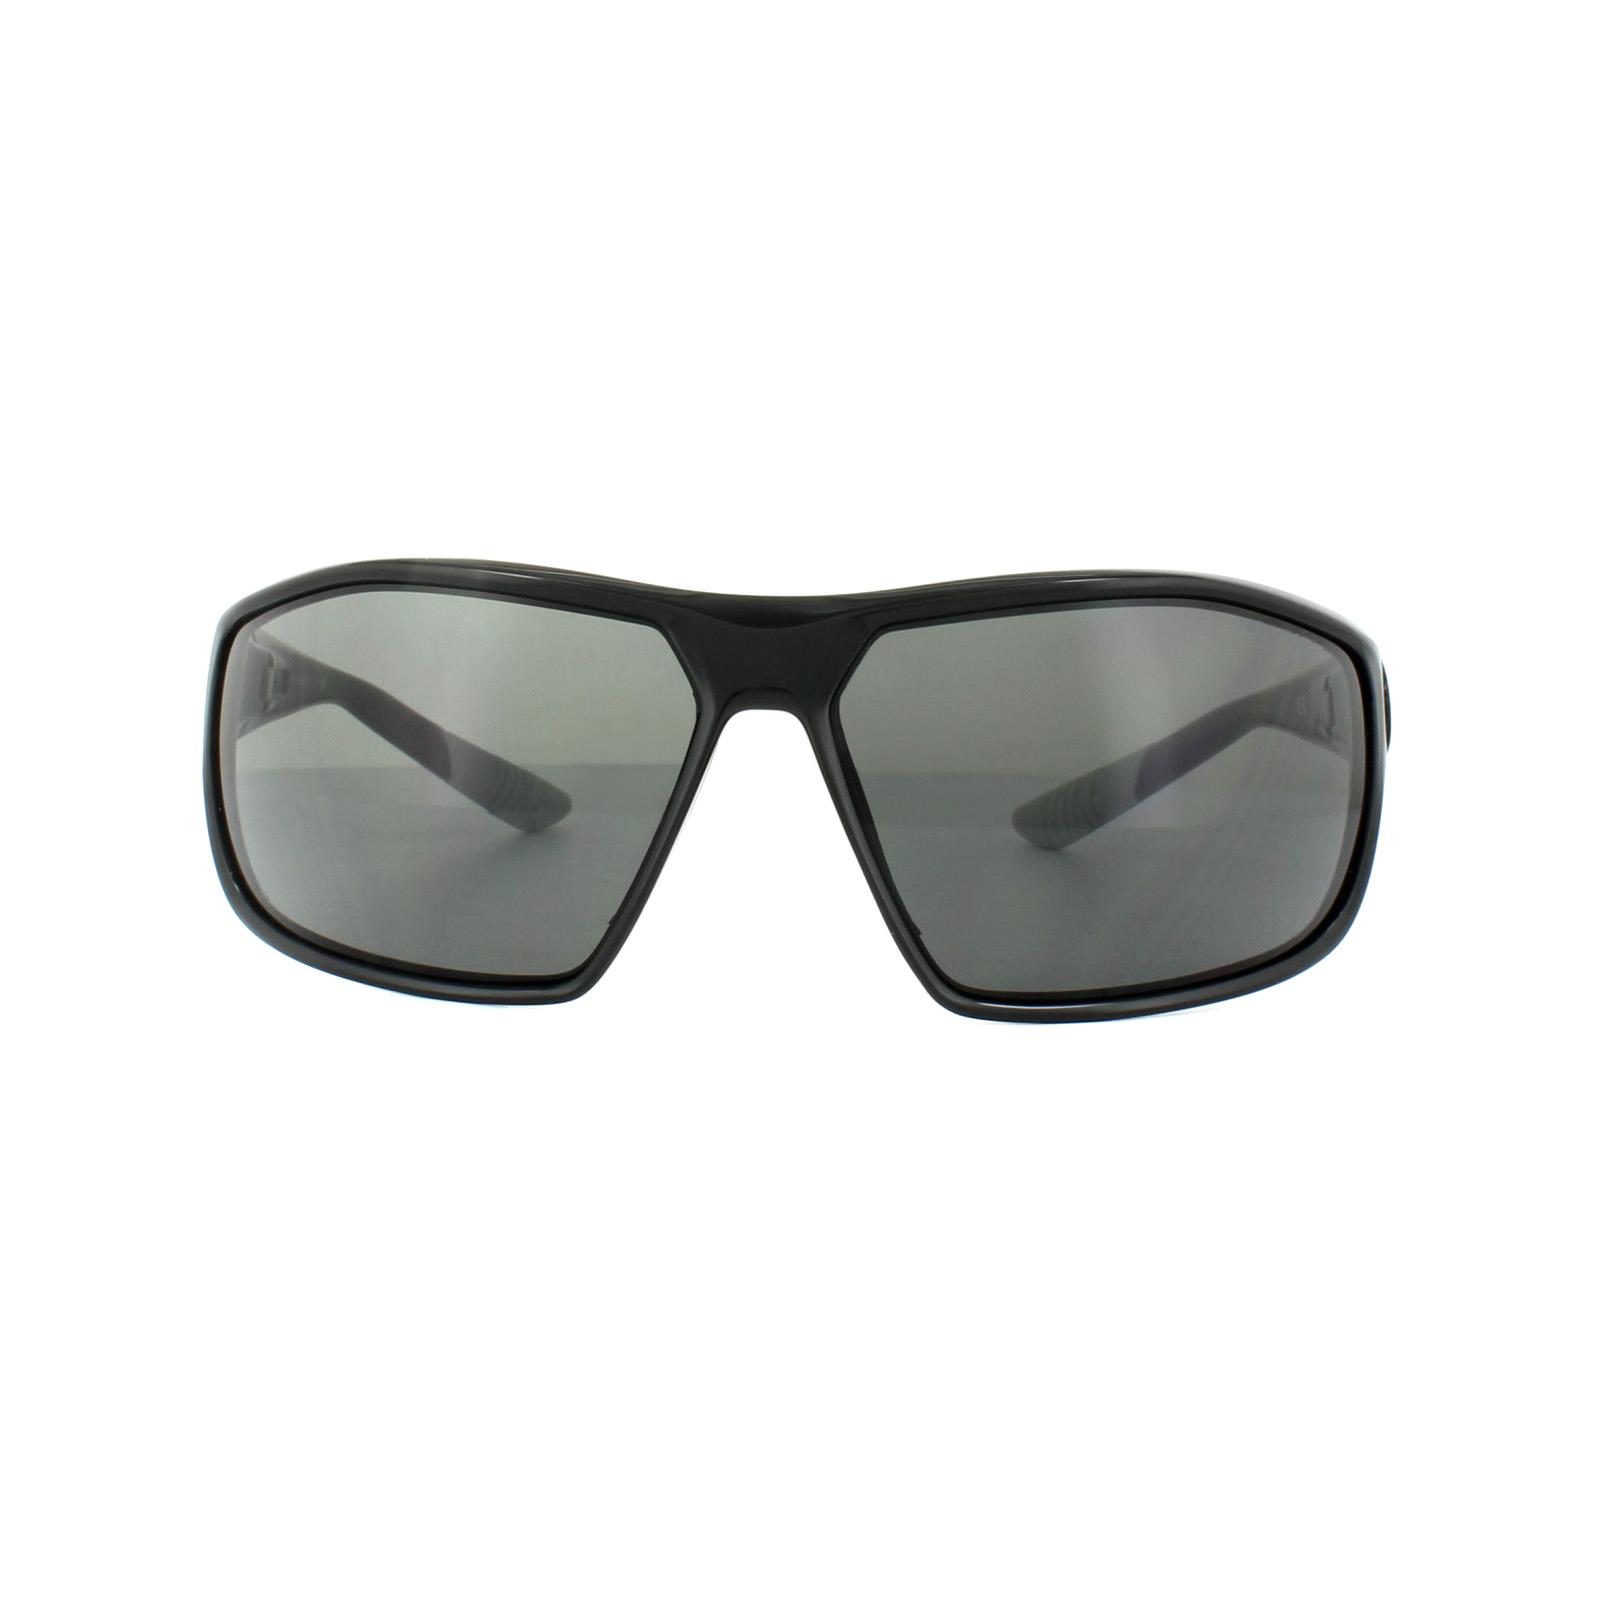 fc64ff885d Cheap Nike Ignition EV0865   EV0867 Sunglasses - Discounted Sunglasses